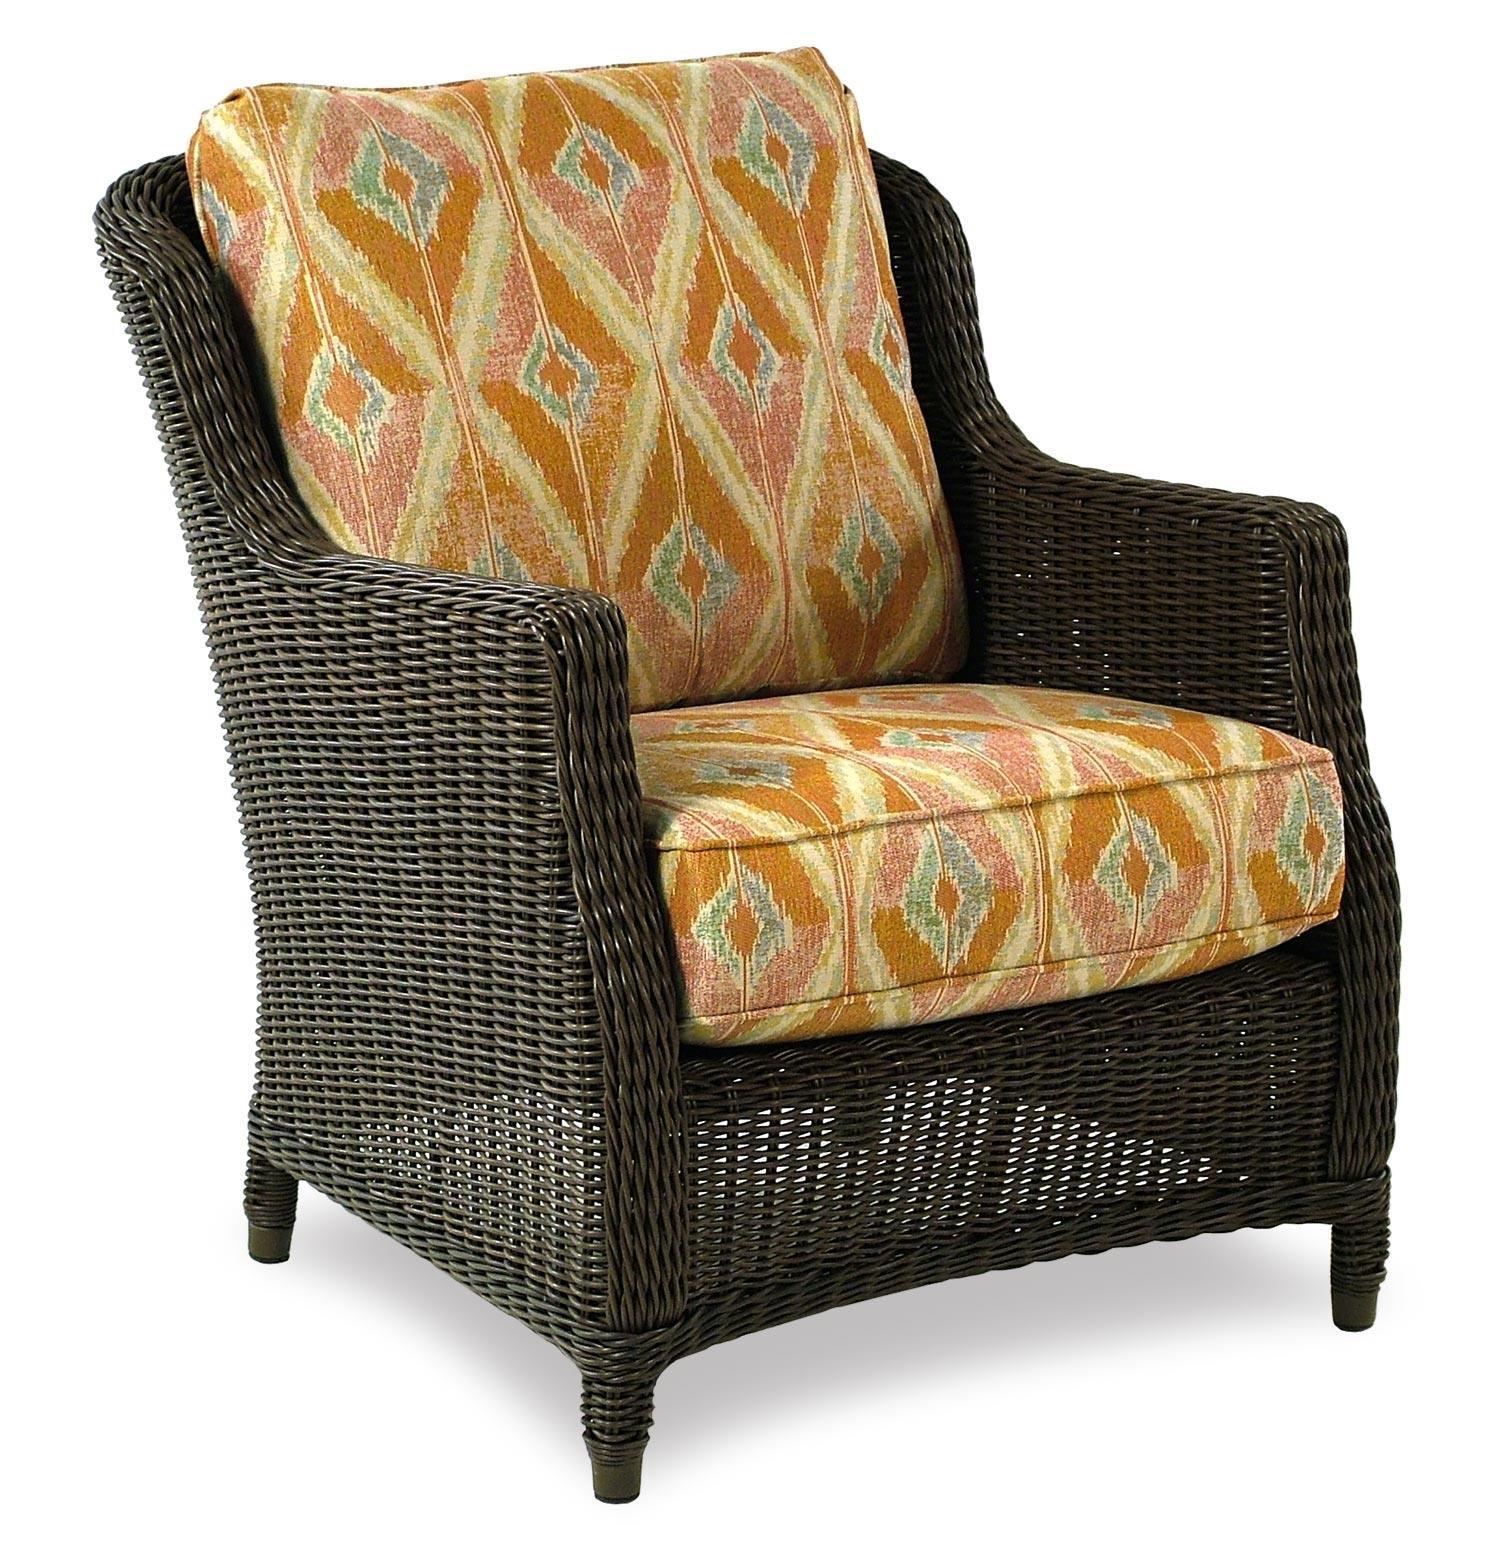 BeachCraft Bayou Outdoor/Patio Chair - Item Number: C9858M